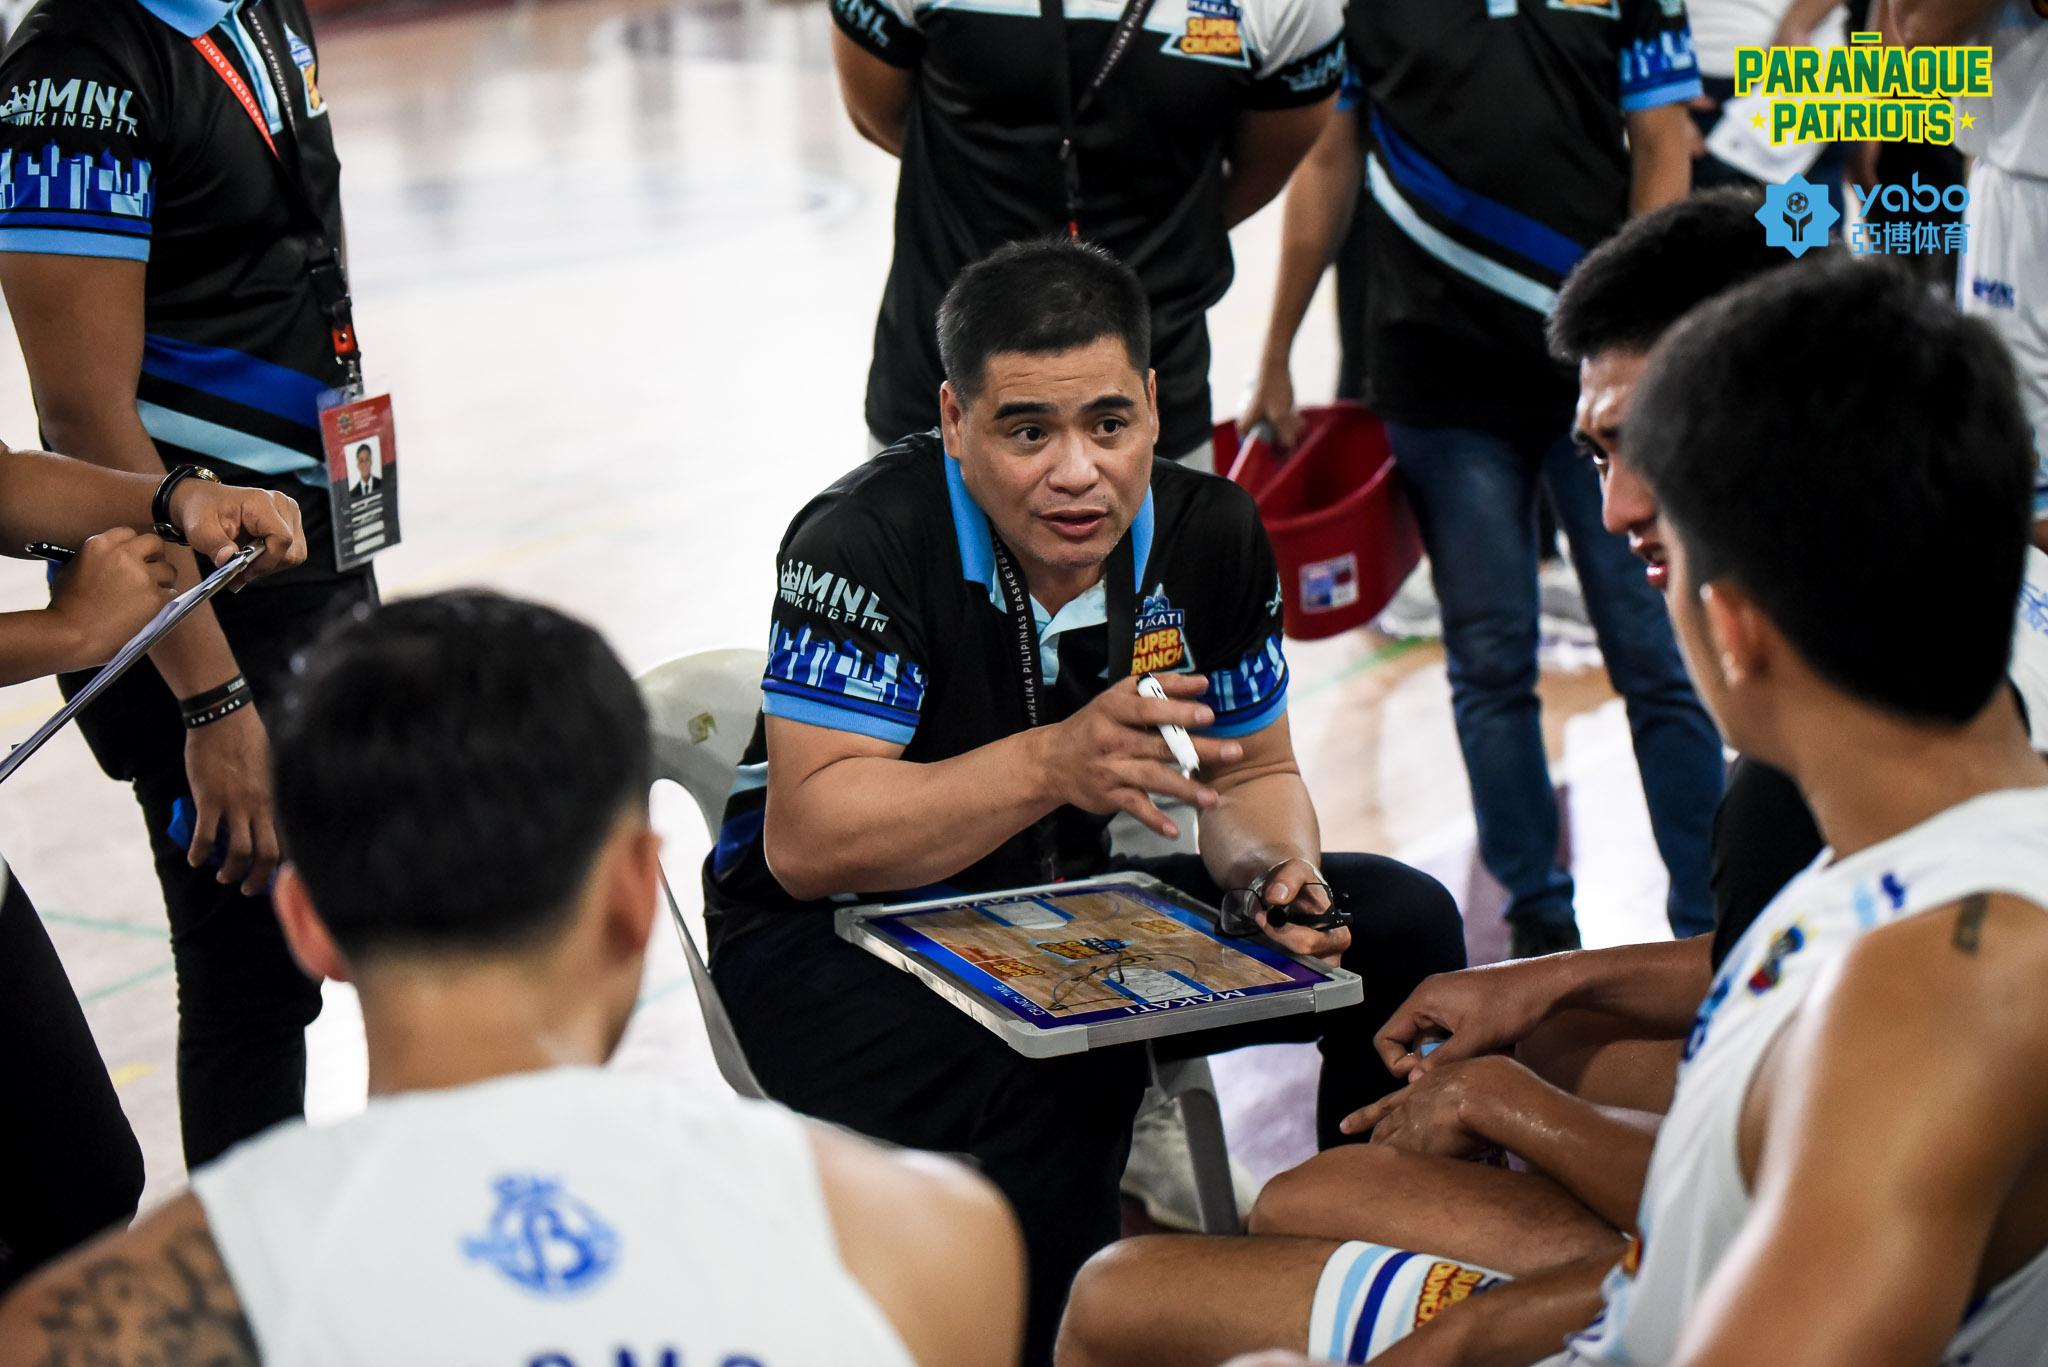 MPBL-2019-Makati-vs-Bacoor-Mendoza Makati Super Crunch team owner says Cholo Villanueva out due to 'personal reasons' Basketball MPBL News  - philippine sports news